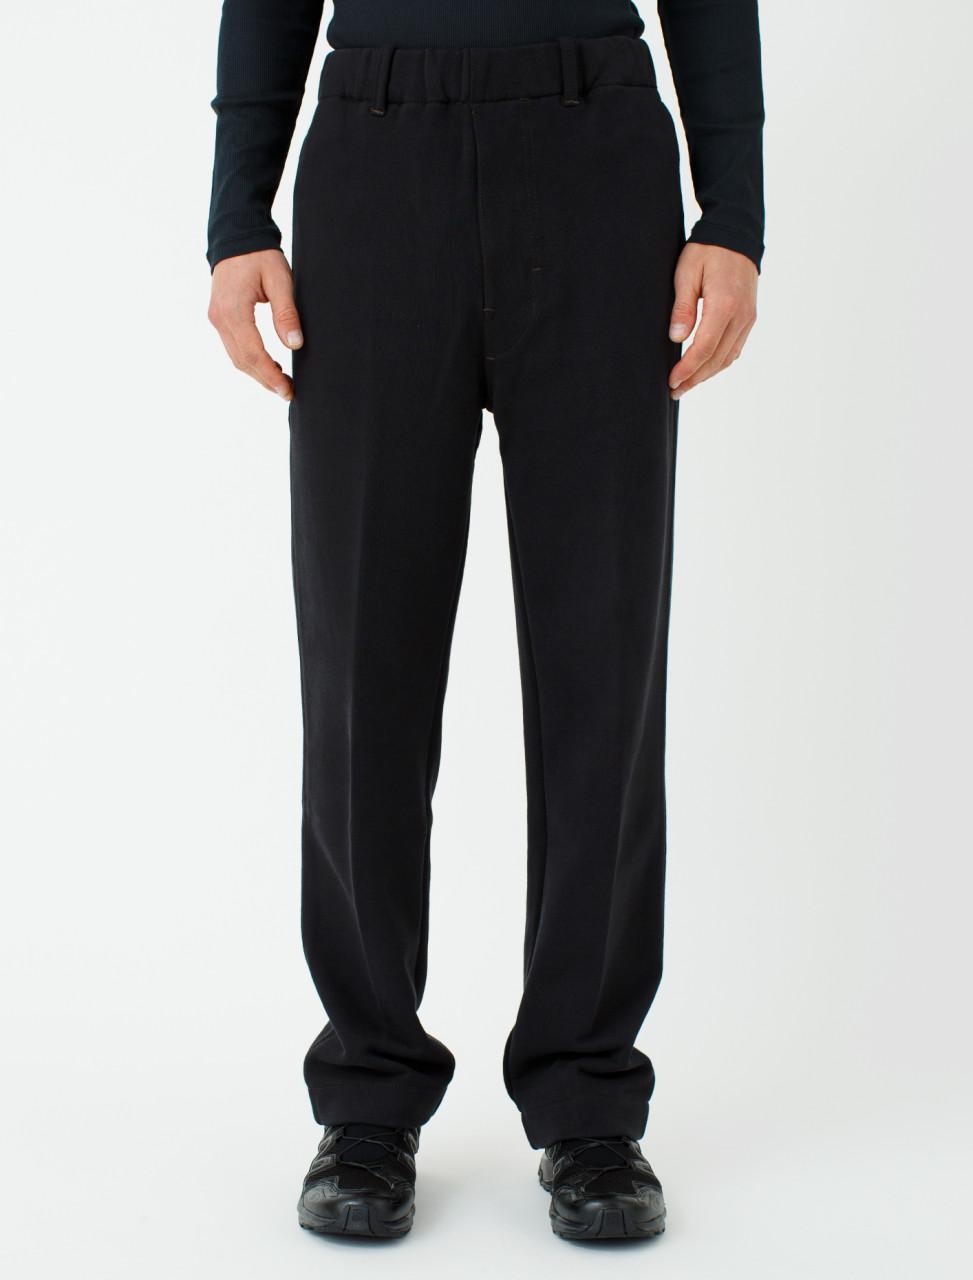 Jersey Chino Trouser